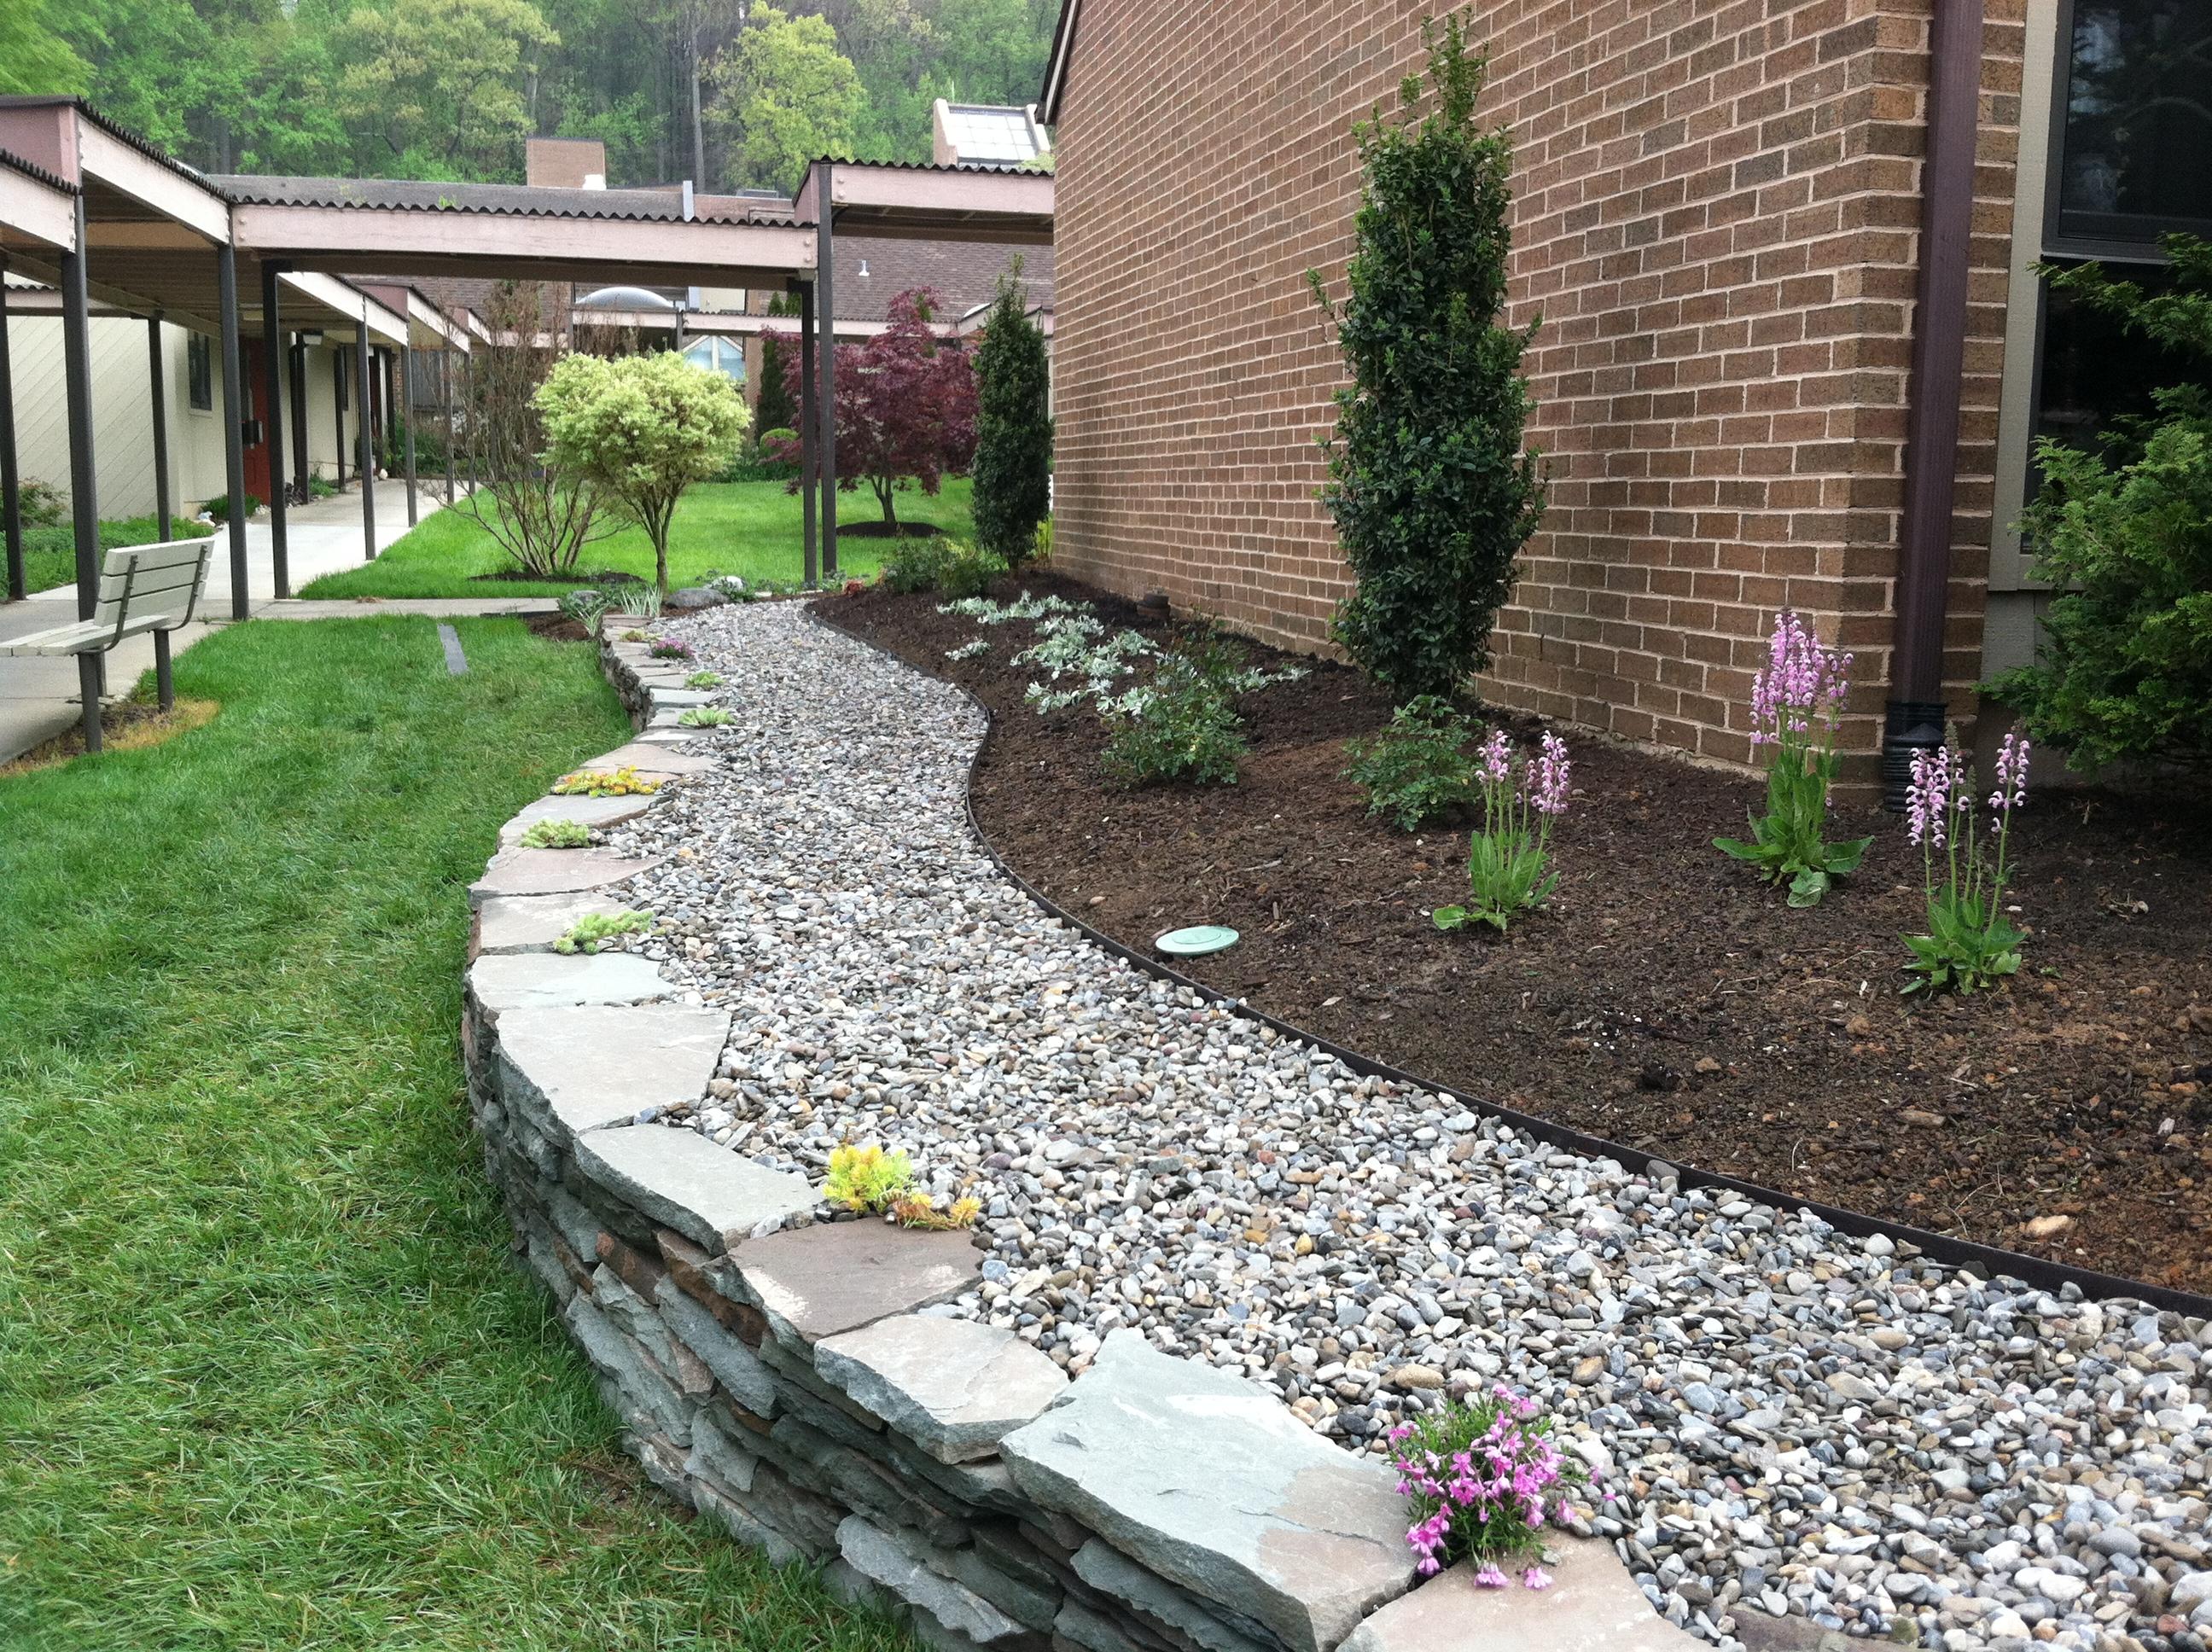 Innovative Garden Design of a Small Property | The Garden ... on Small Garden Ideas With Rocks id=24370